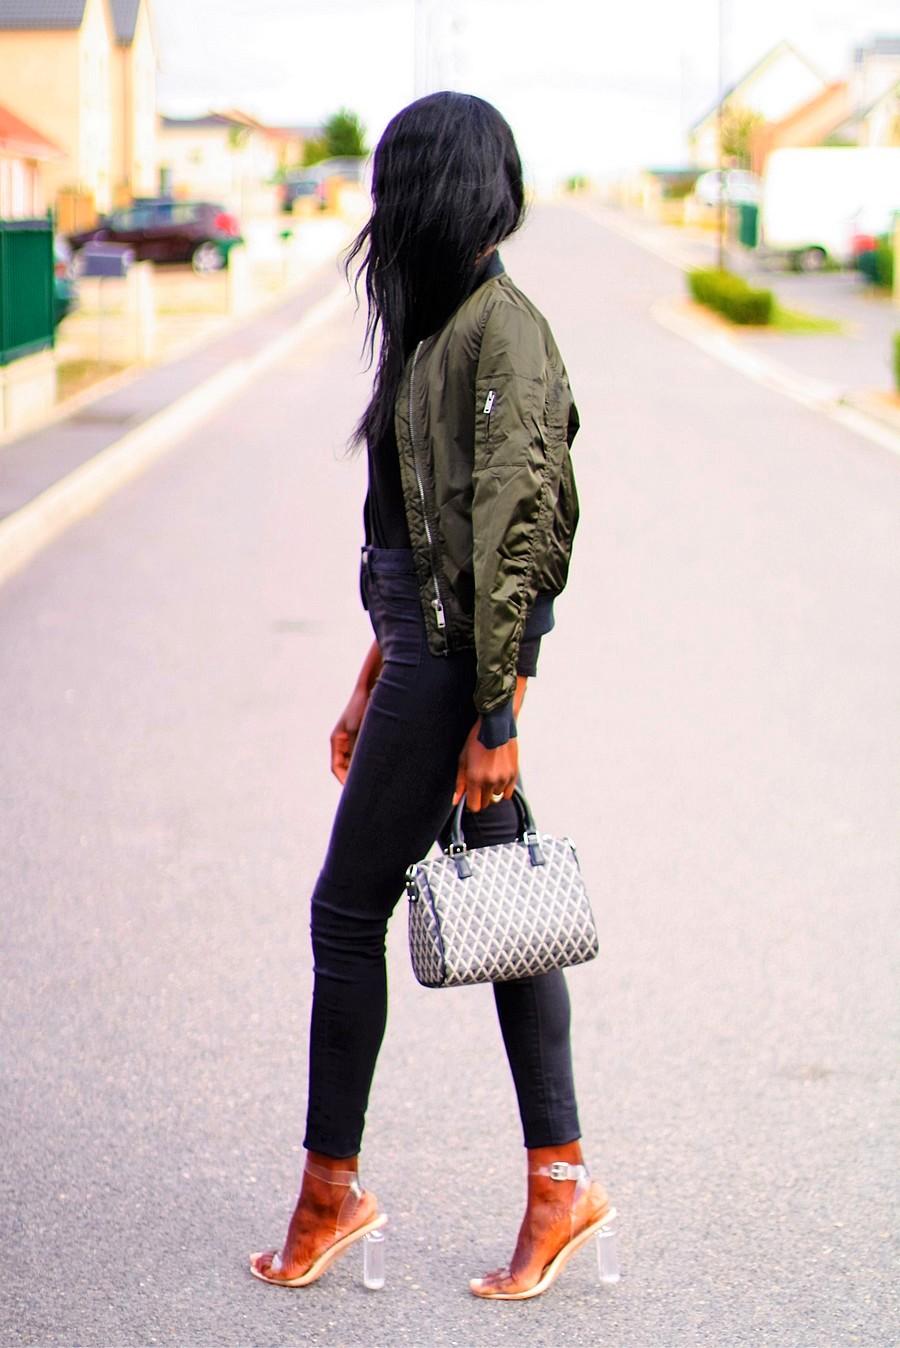 ootd-kaki-bomber-black-bodysuit-high-waist-jeans-perspex-heels-ikon-lancaster-bag